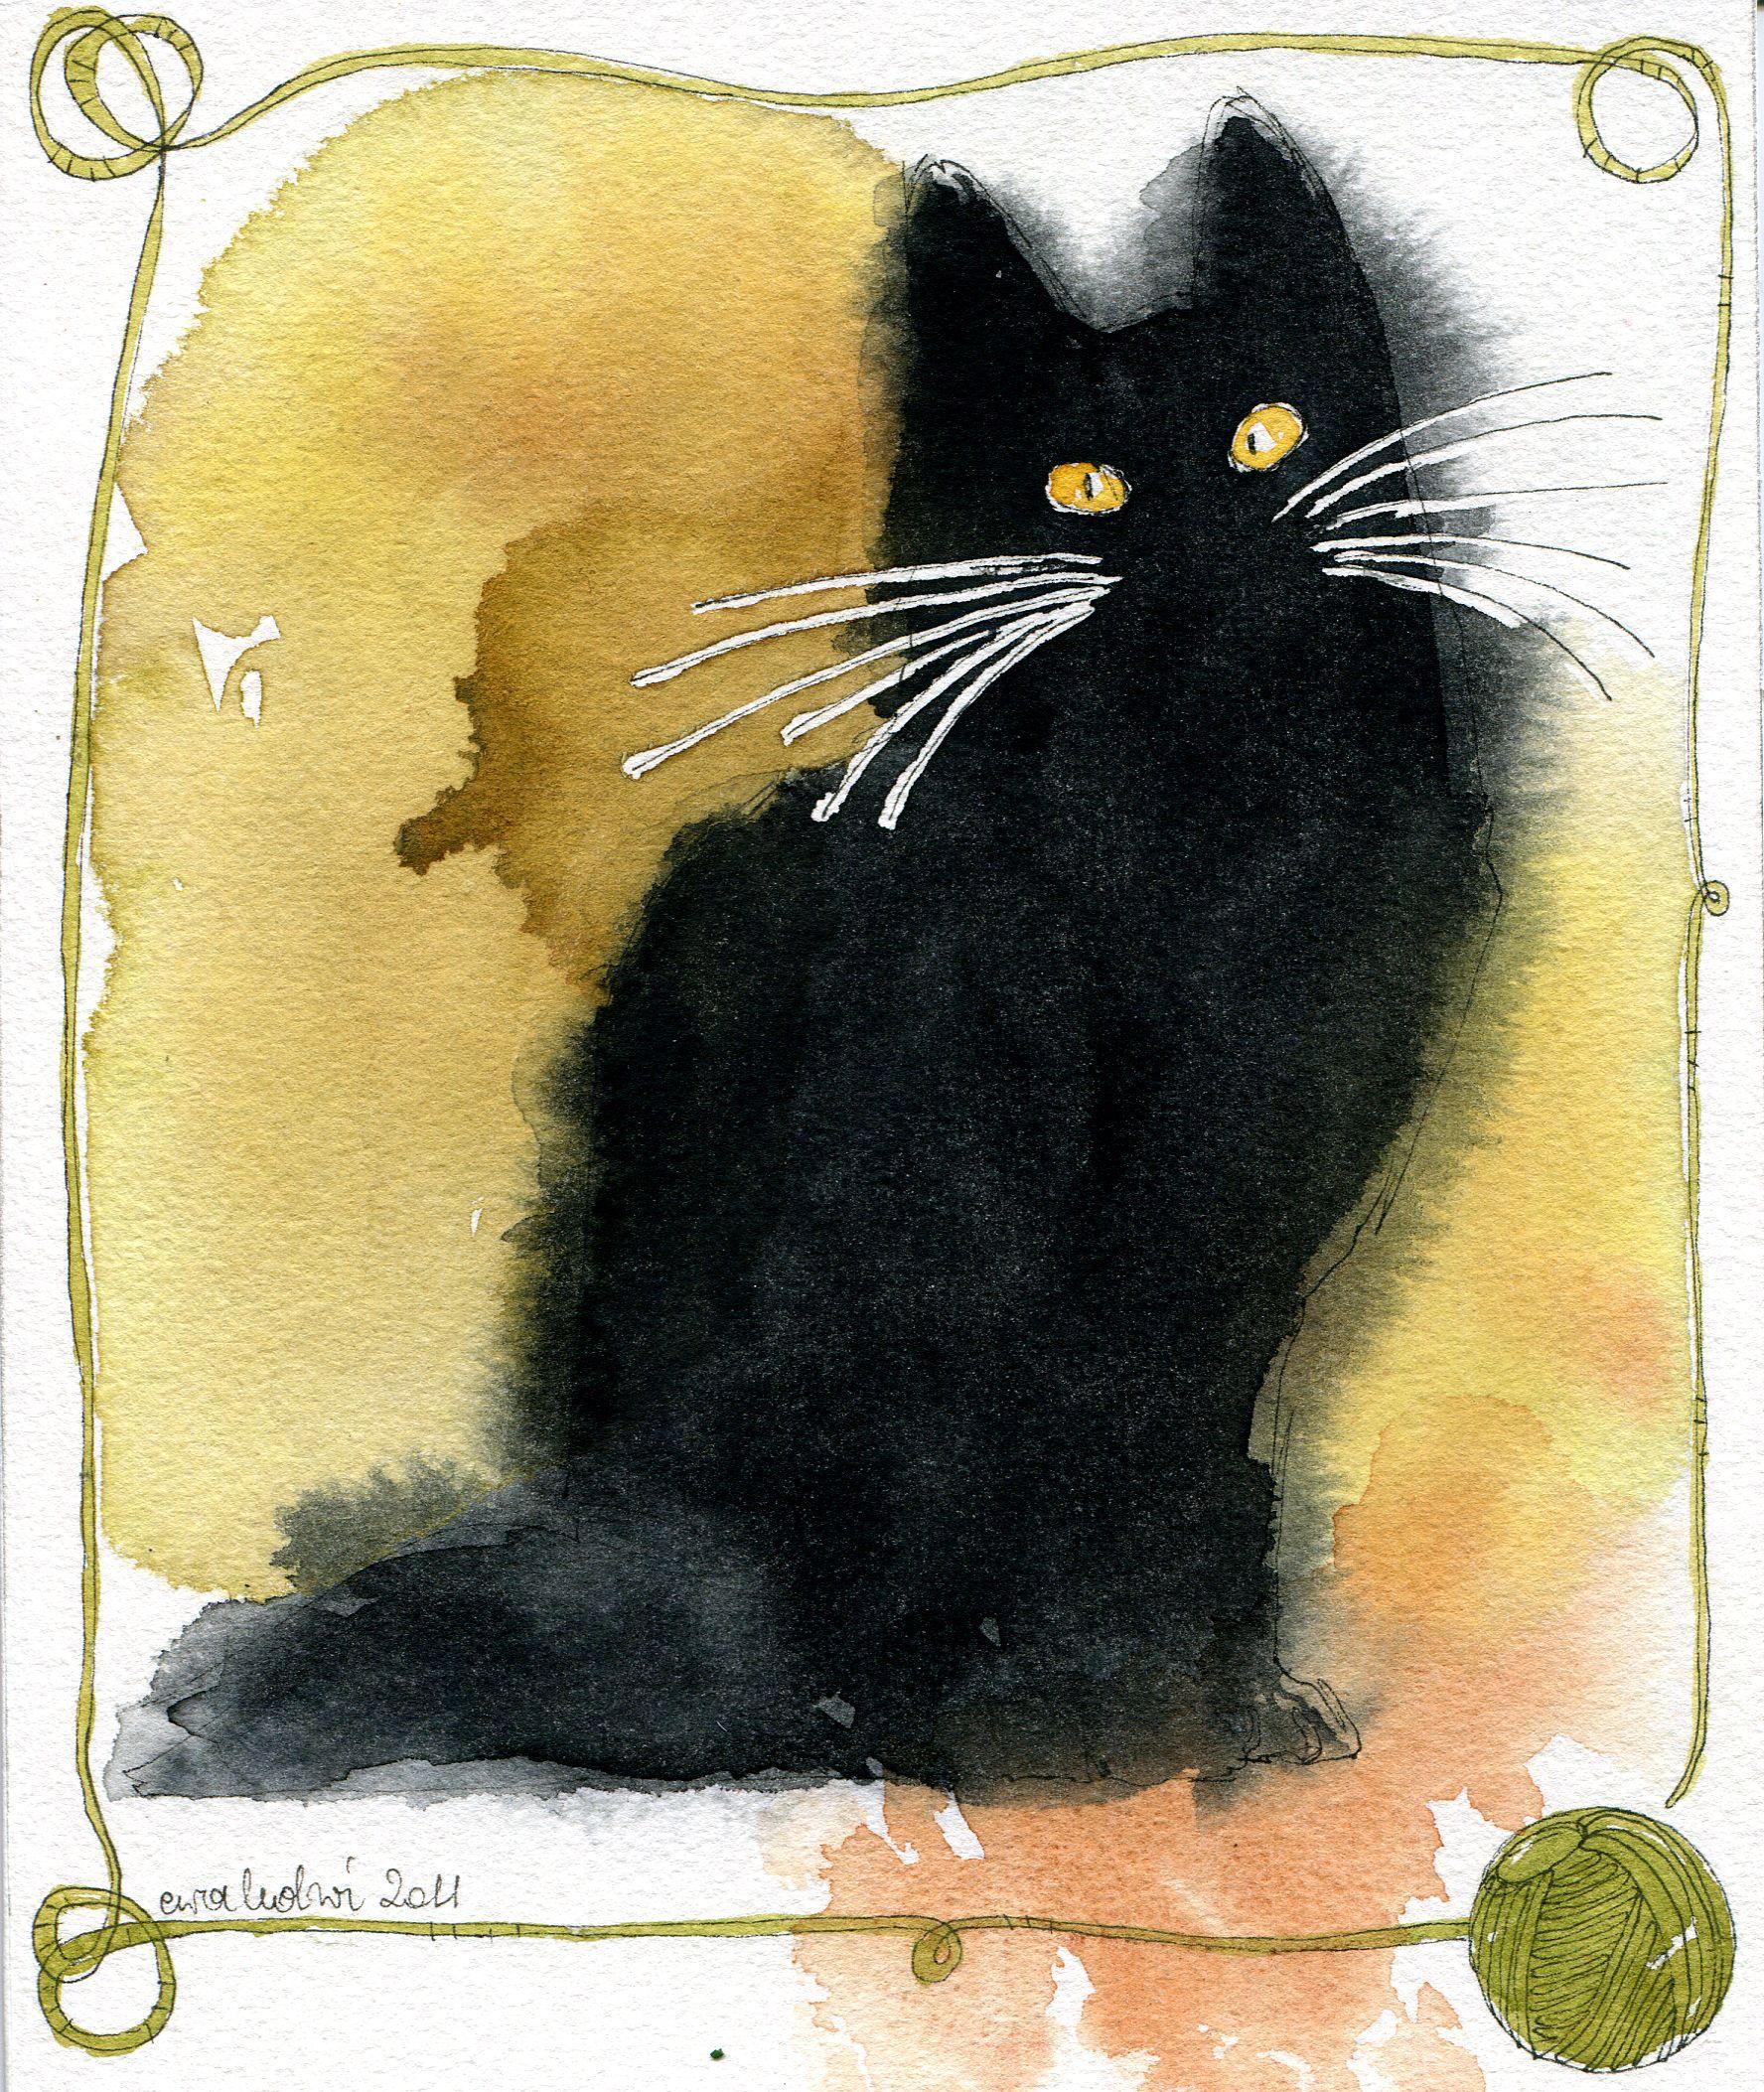 cat1 by ewaludwi.deviantart.com on @deviantART